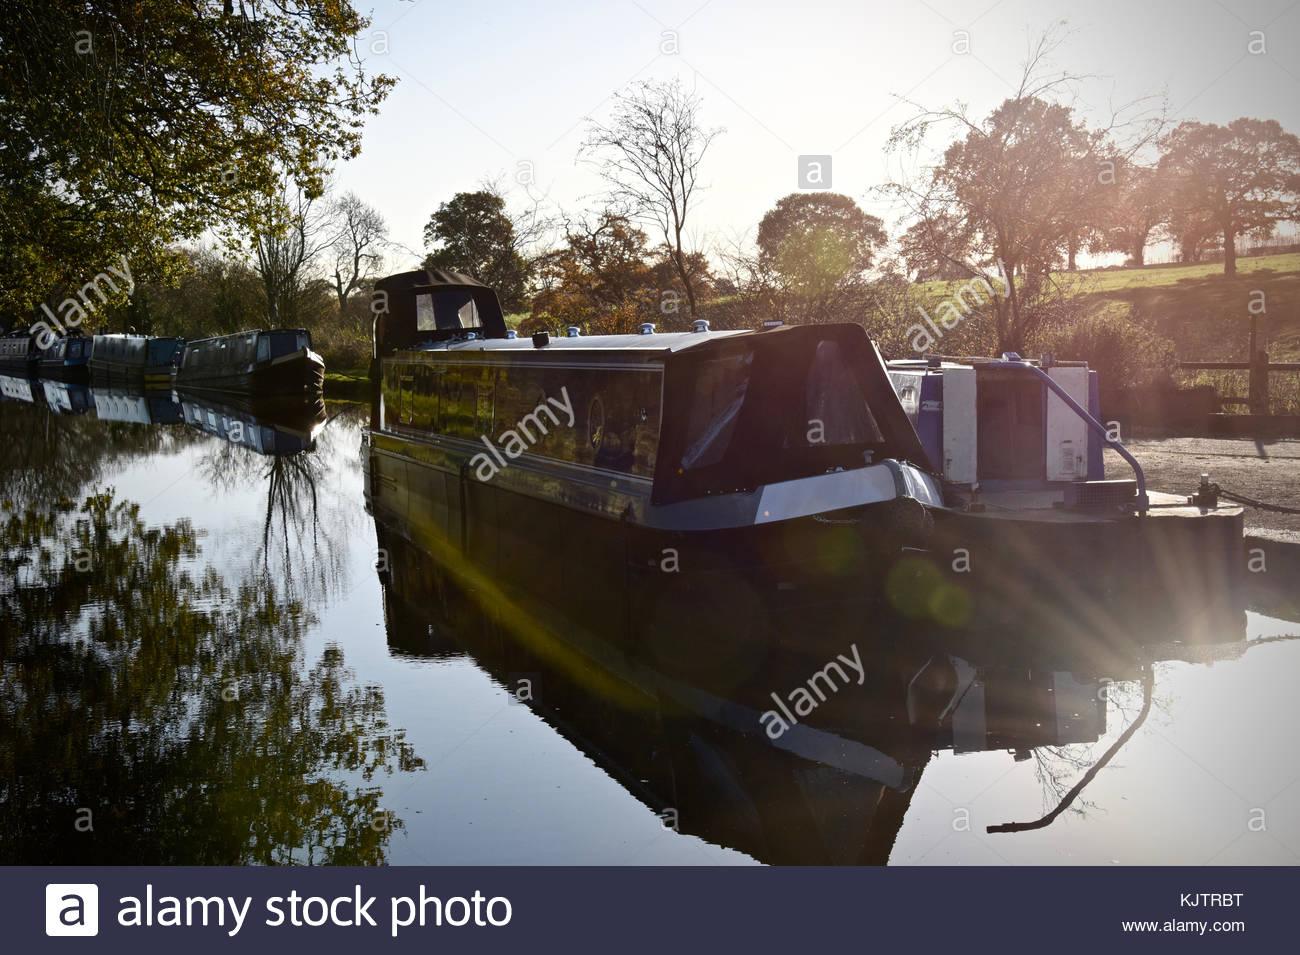 Narrowboat on a frosty autumn morning. - Stock Image